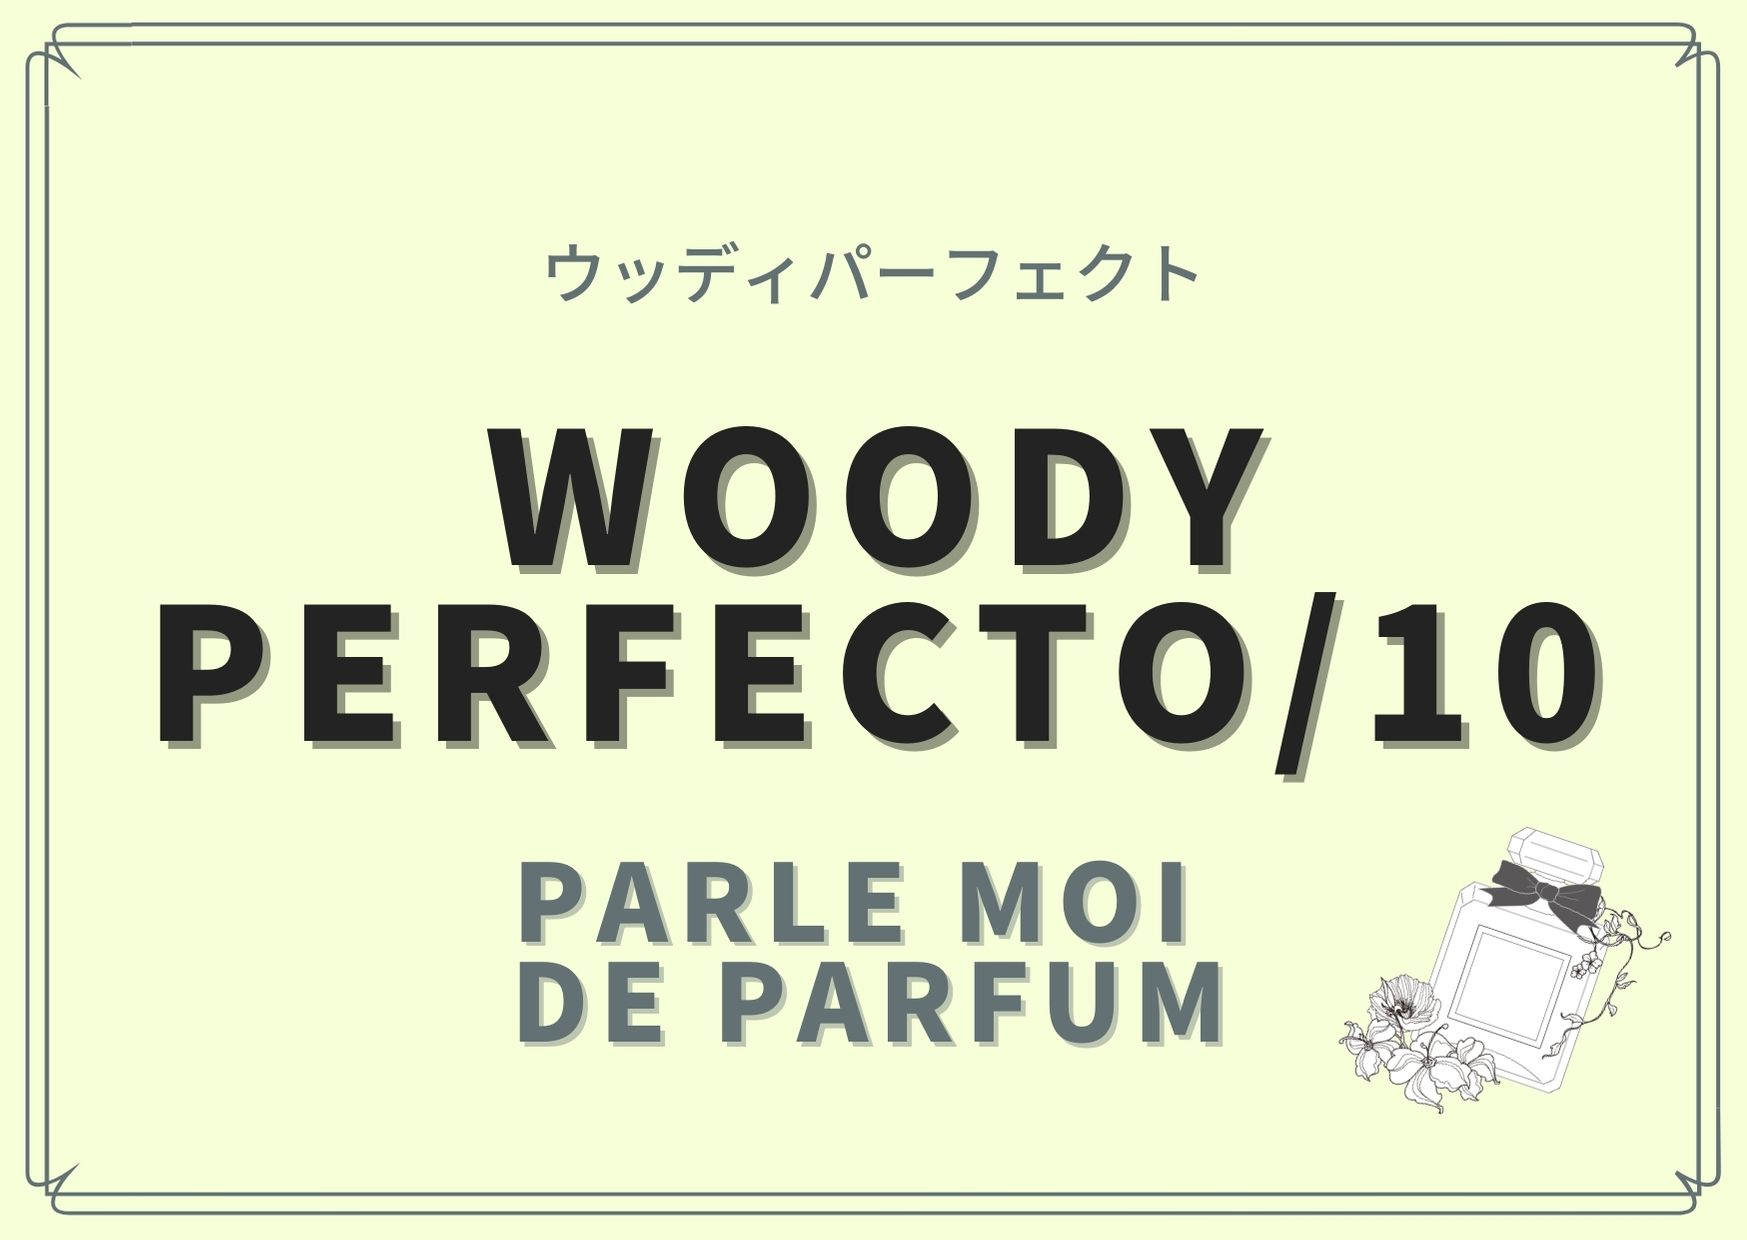 WOODY PERFECTO/10(ウッディパーフェクト )/PARLE MOI DE PARFUM(パルル モア ドゥ パルファム)